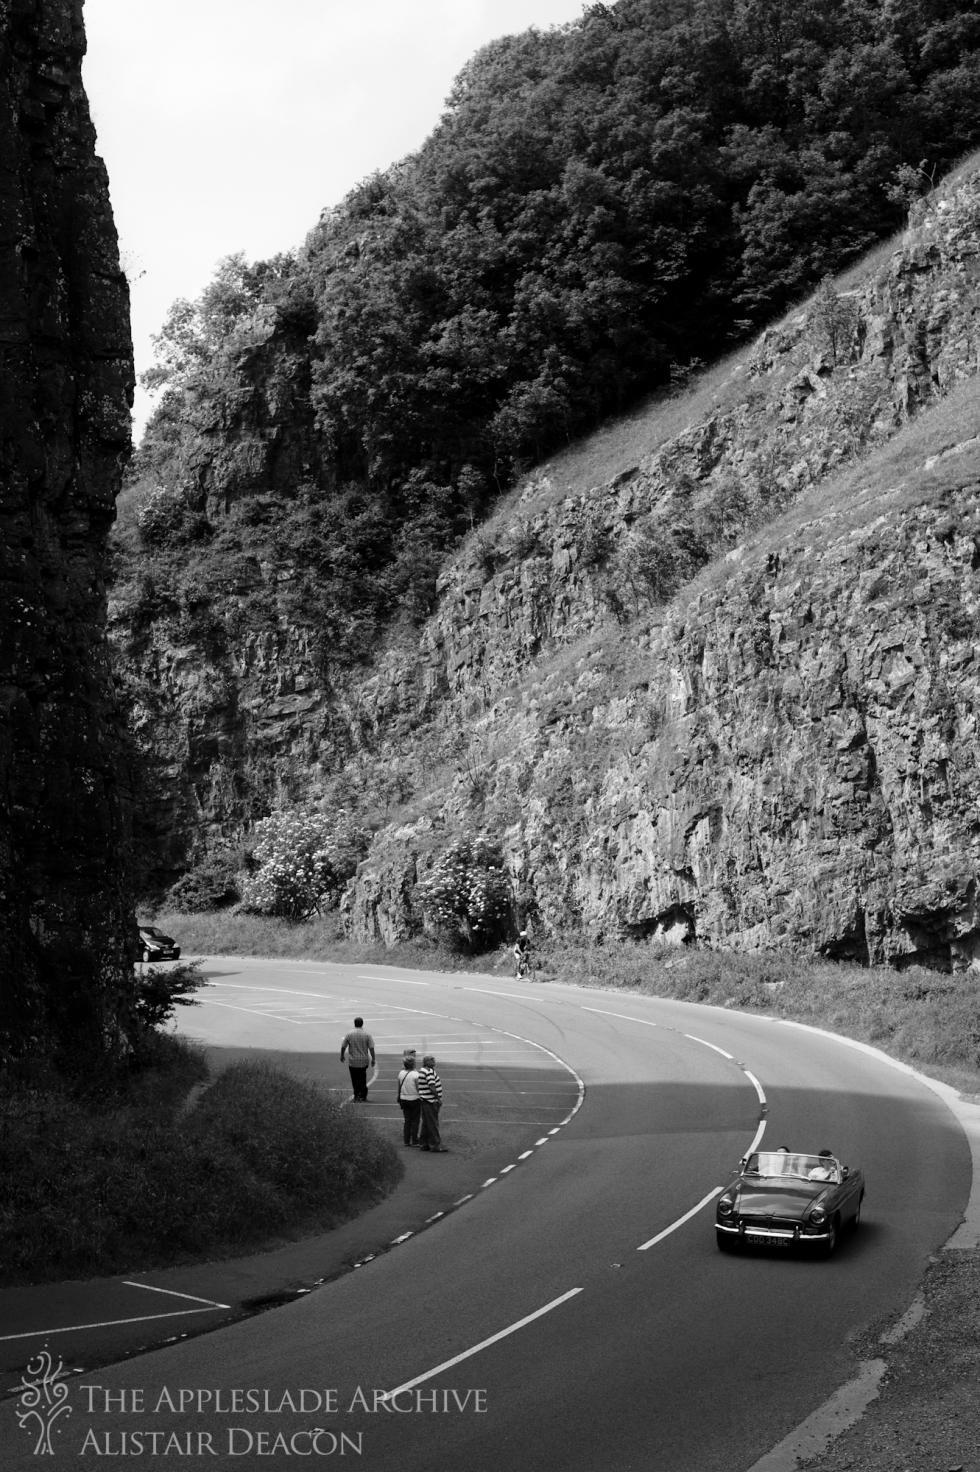 Cheddar Gorge, Somerset, 5th July 2013